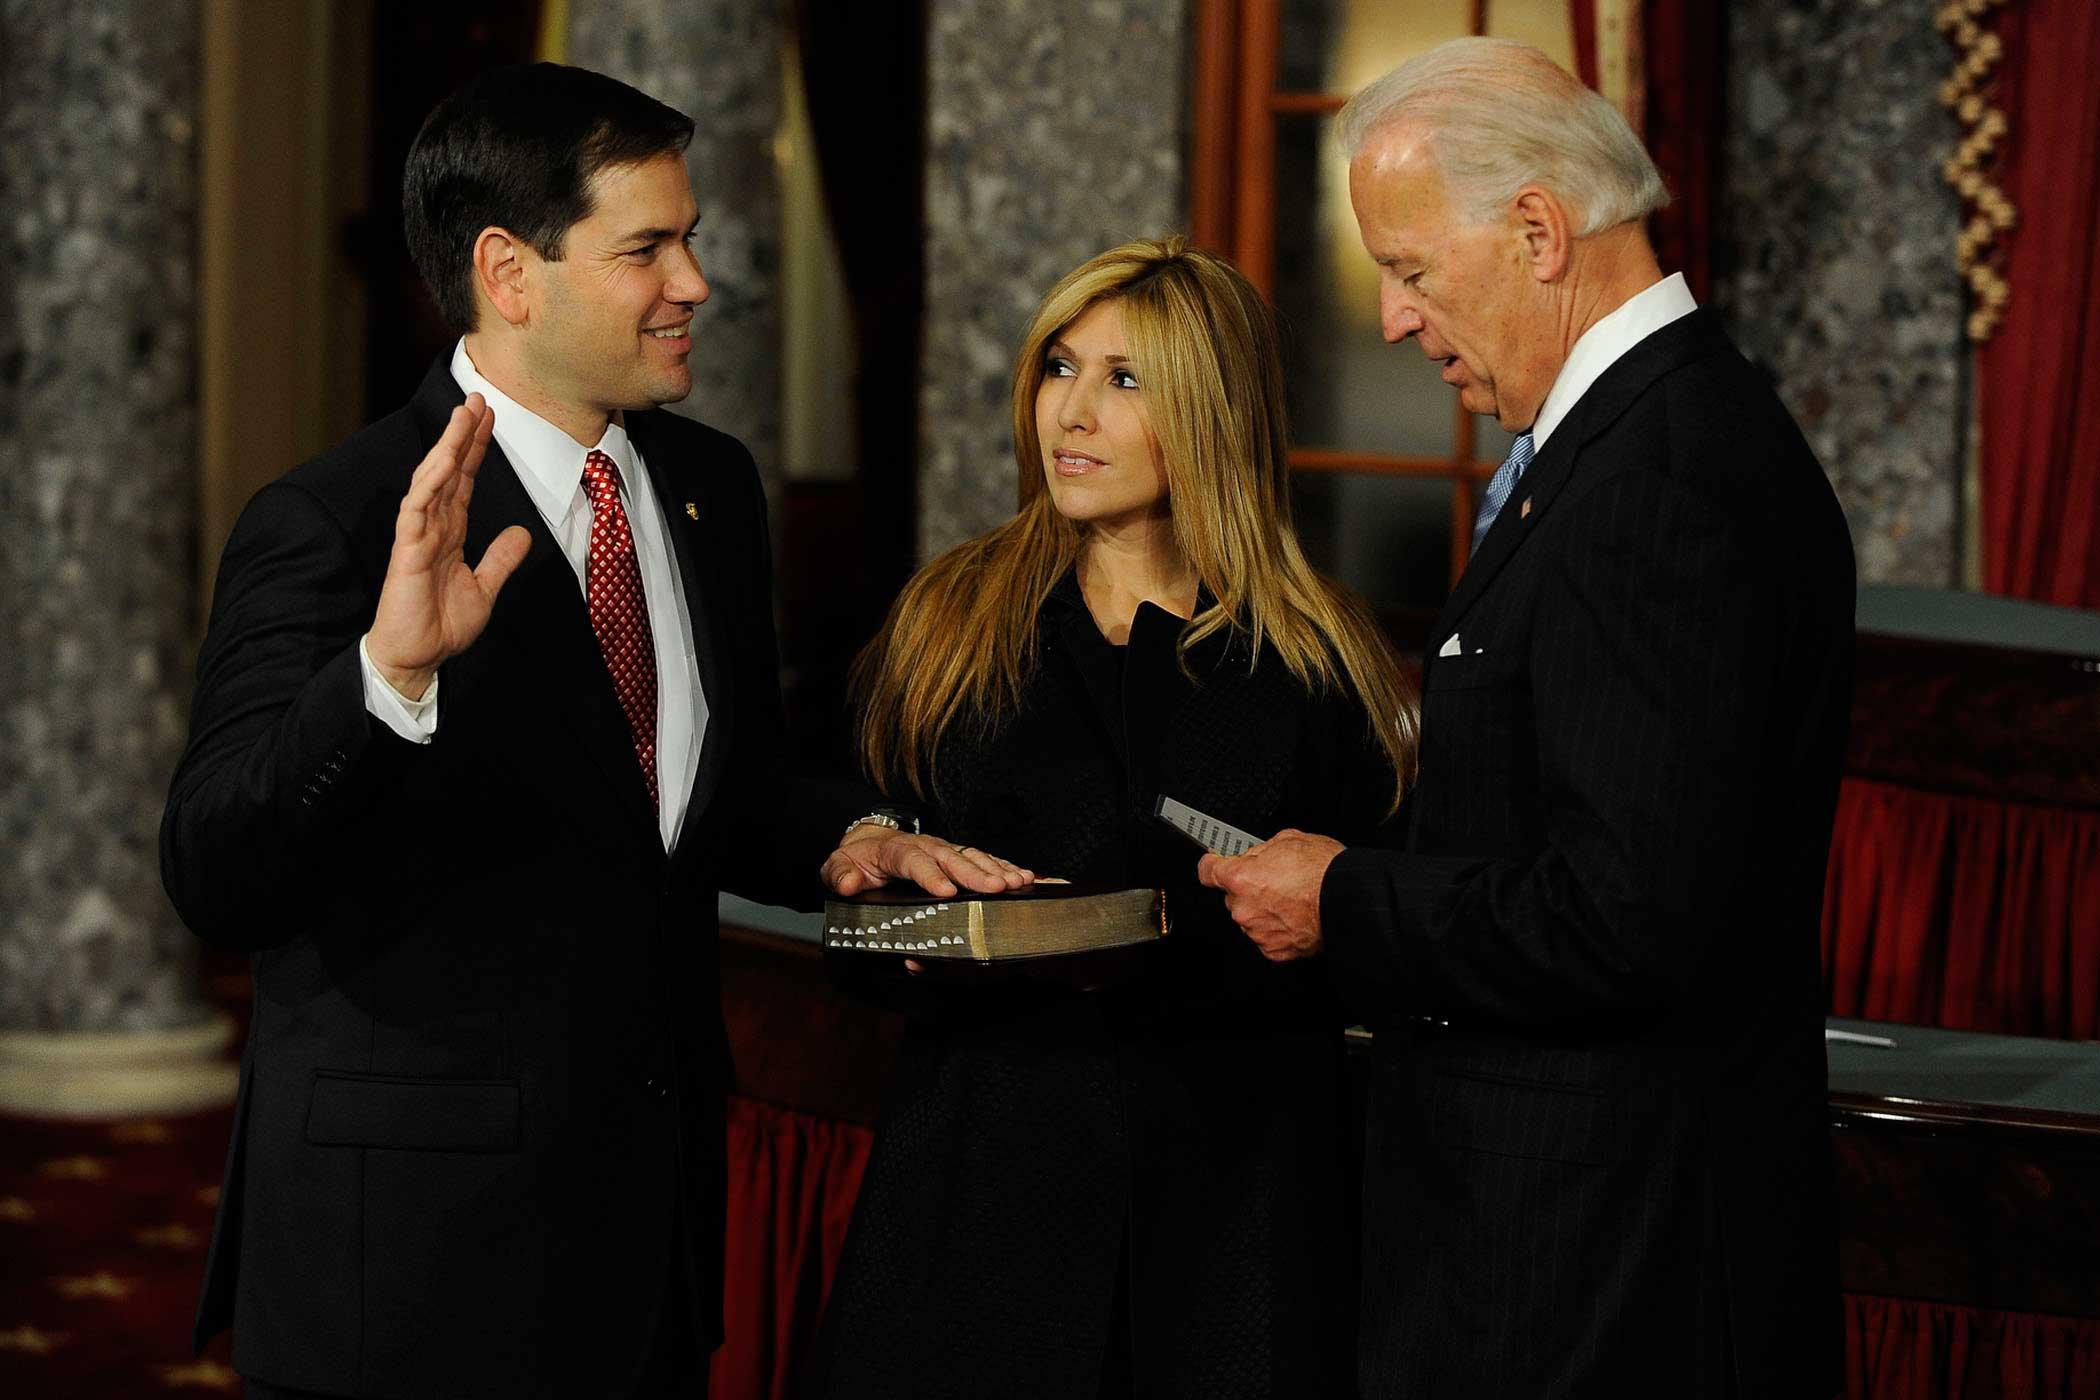 Vice President Joe Biden swears in Senator Marco Rubio to the U.S. Senate, as his wife, Jeanette Rubio looks on, in Washington, on Jan. 5, 2010 .